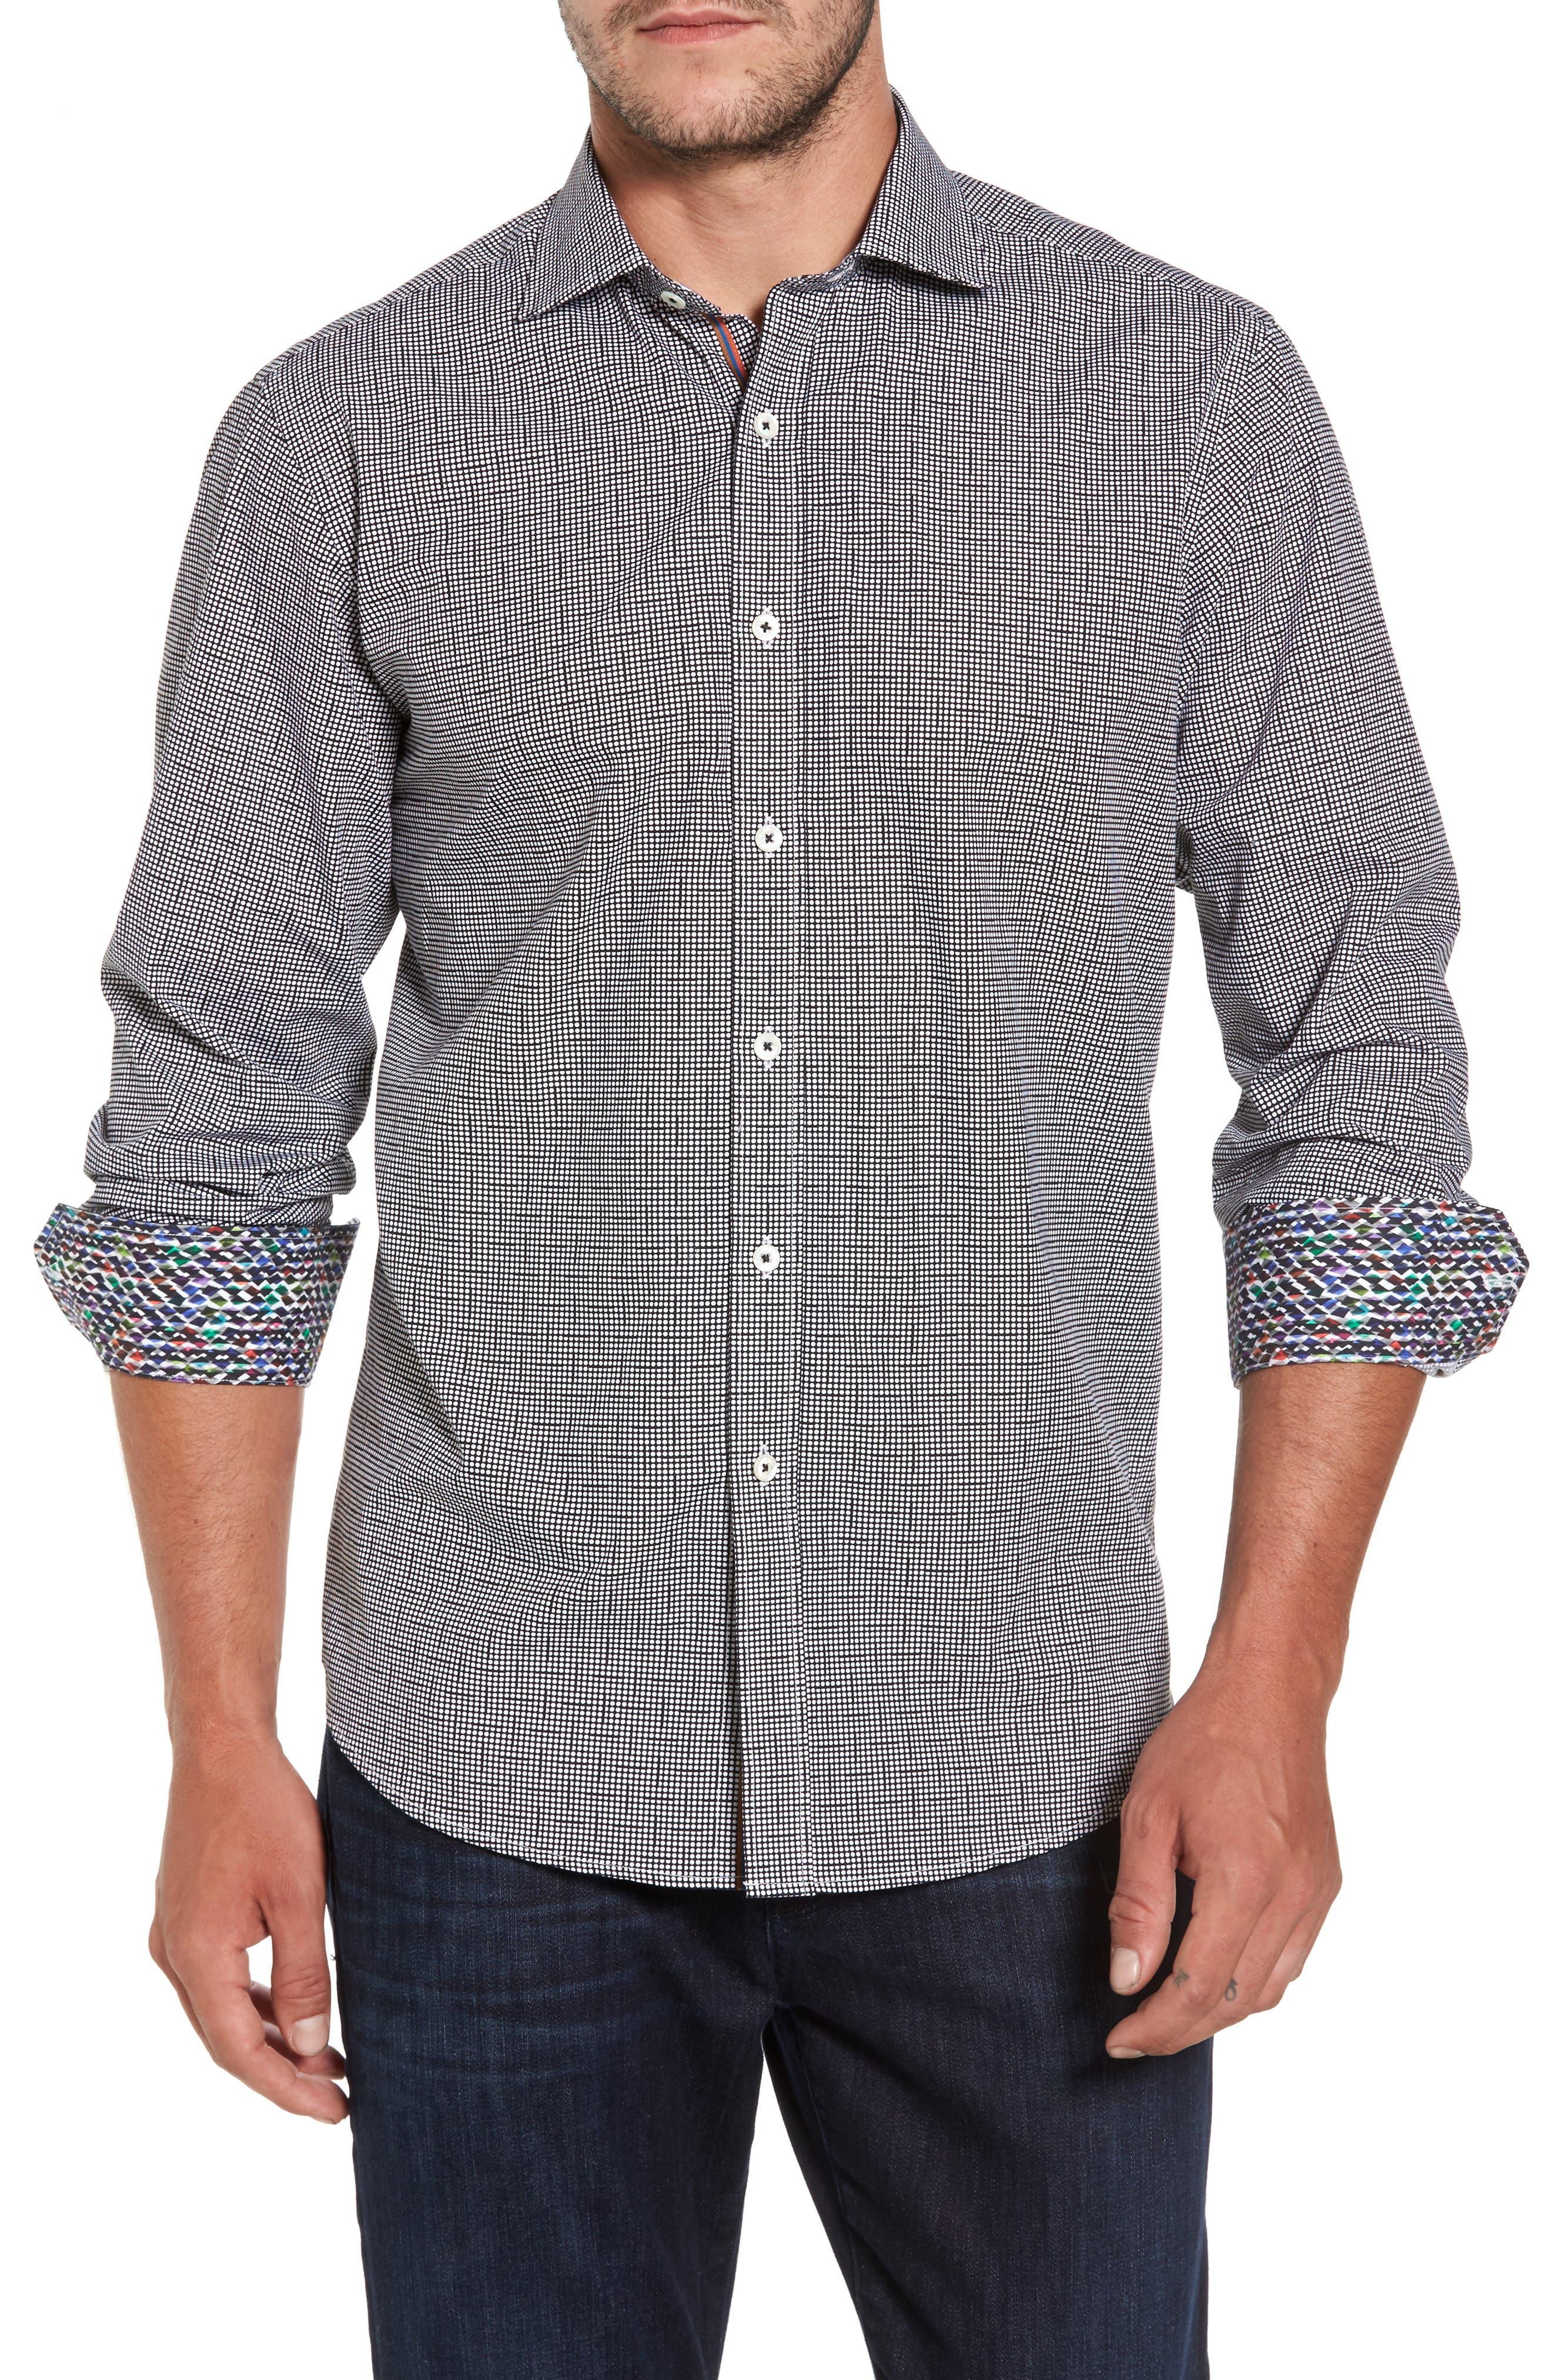 Alternate Image 1 Selected - Bugatchi Classic Fit Dot Print Sport Shirt